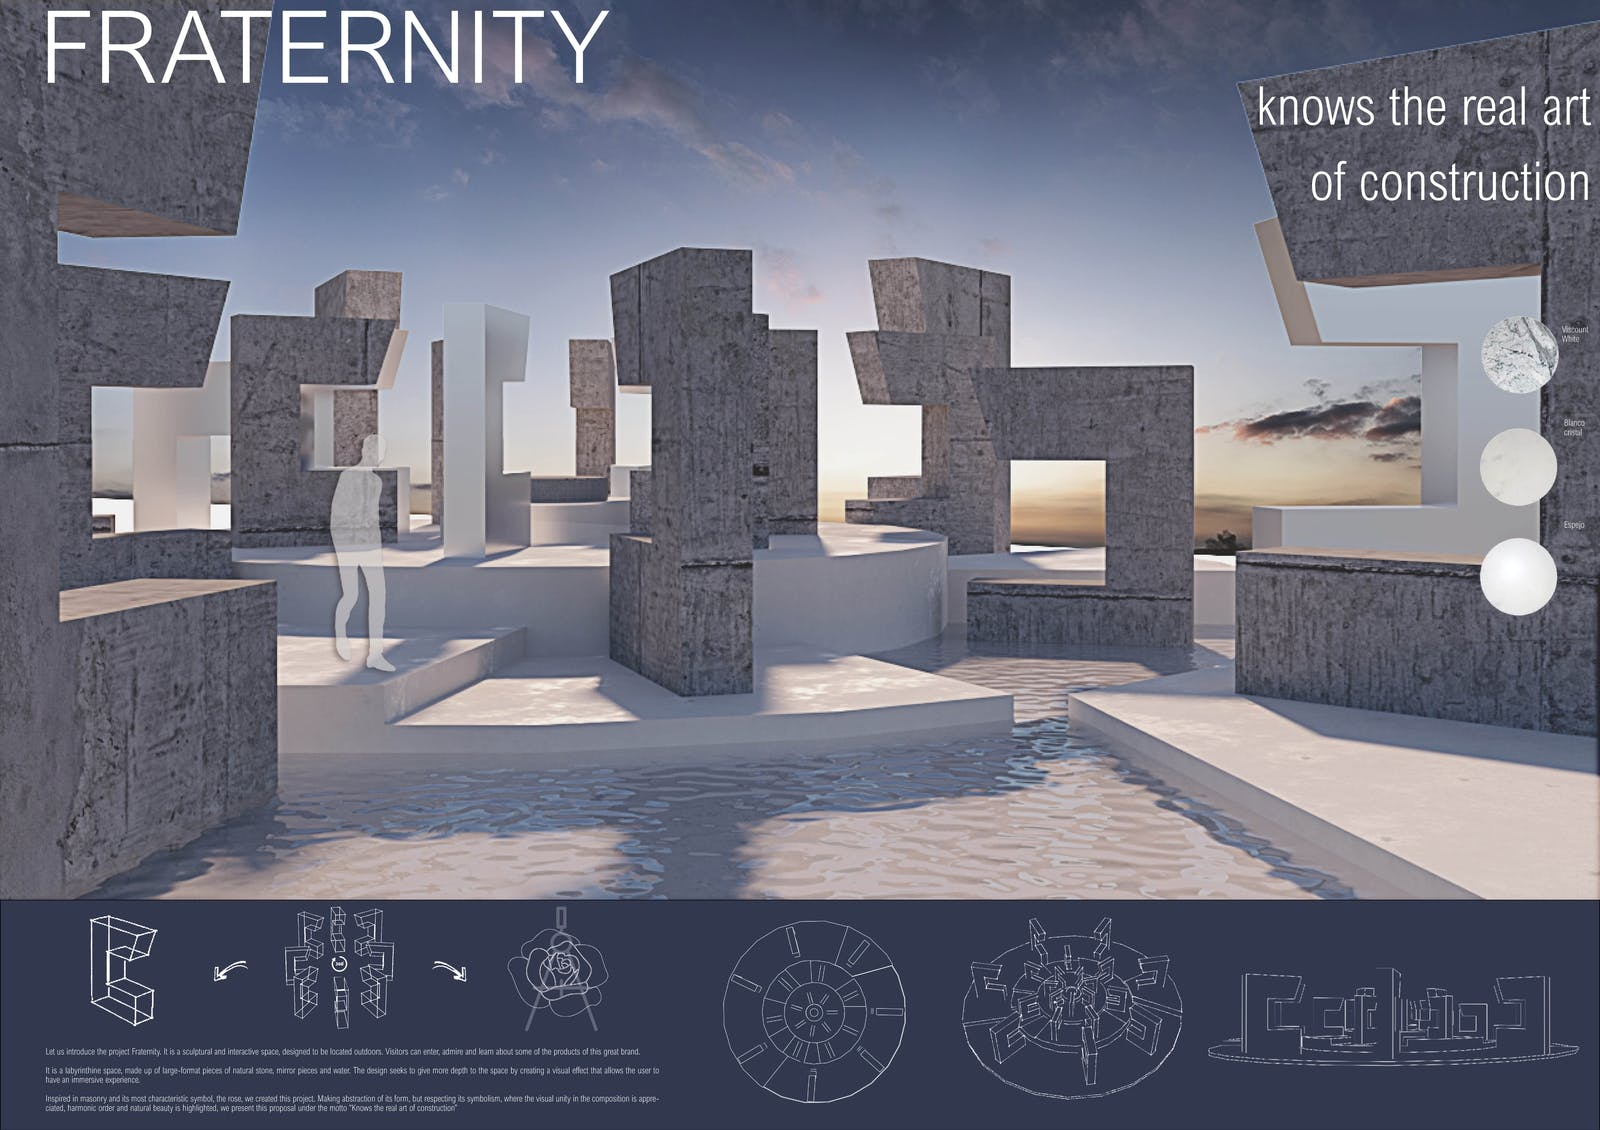 Image of 084 Fraternity s 1 in Ganadores Cosentino Design Challenge 14 - Cosentino